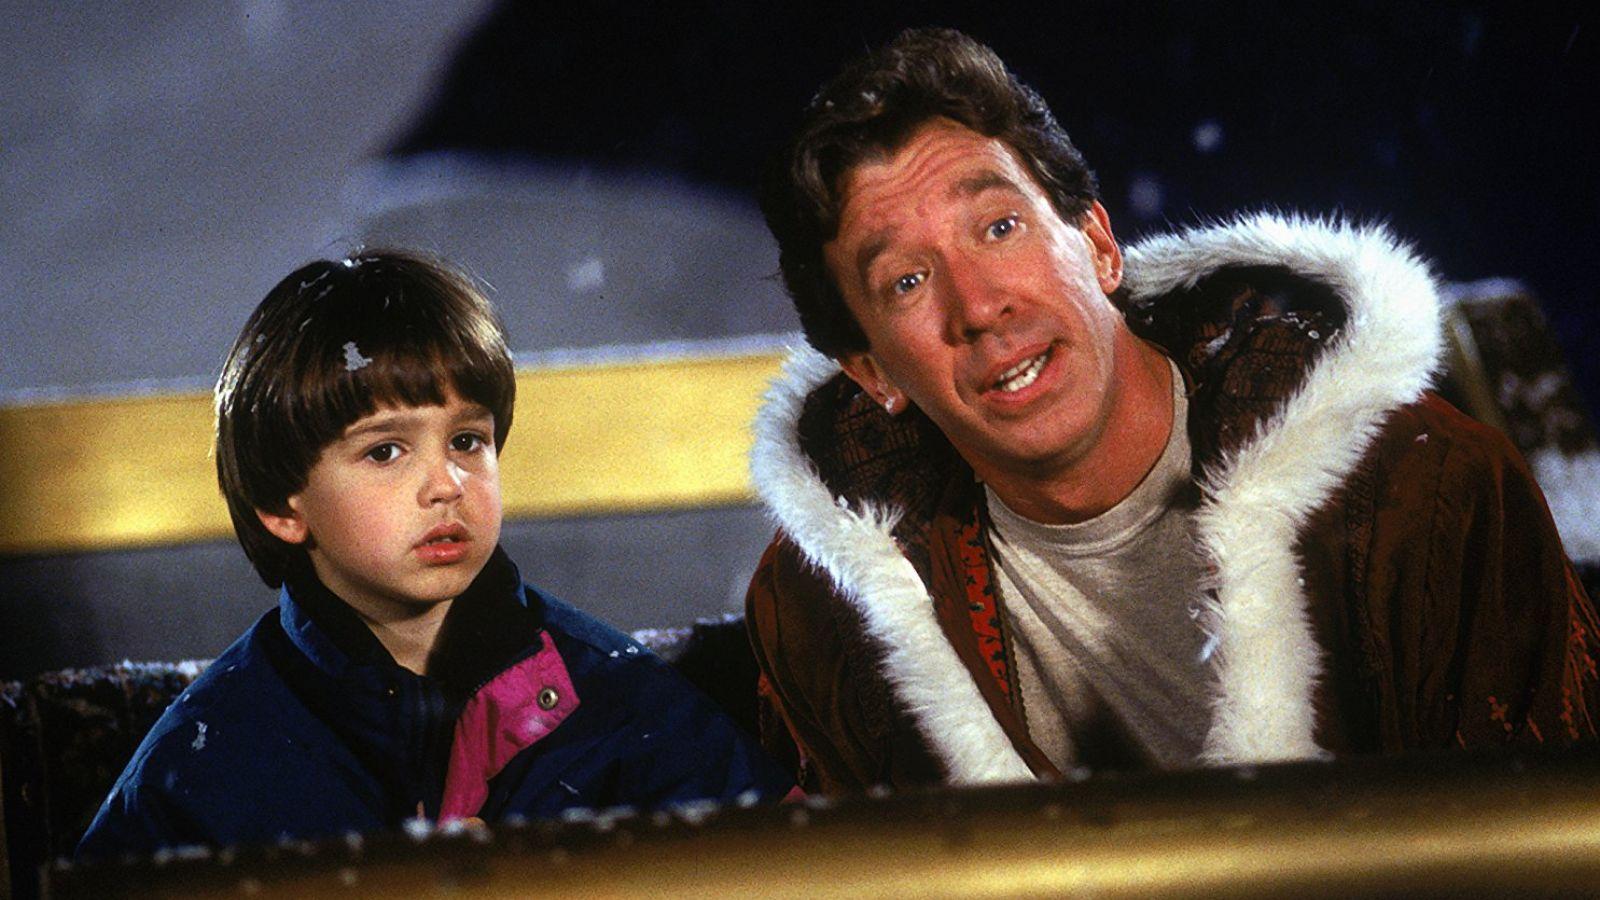 The Santa Clause\' stars Tim Allen, Eric Lloyd share 9 secrets about ...